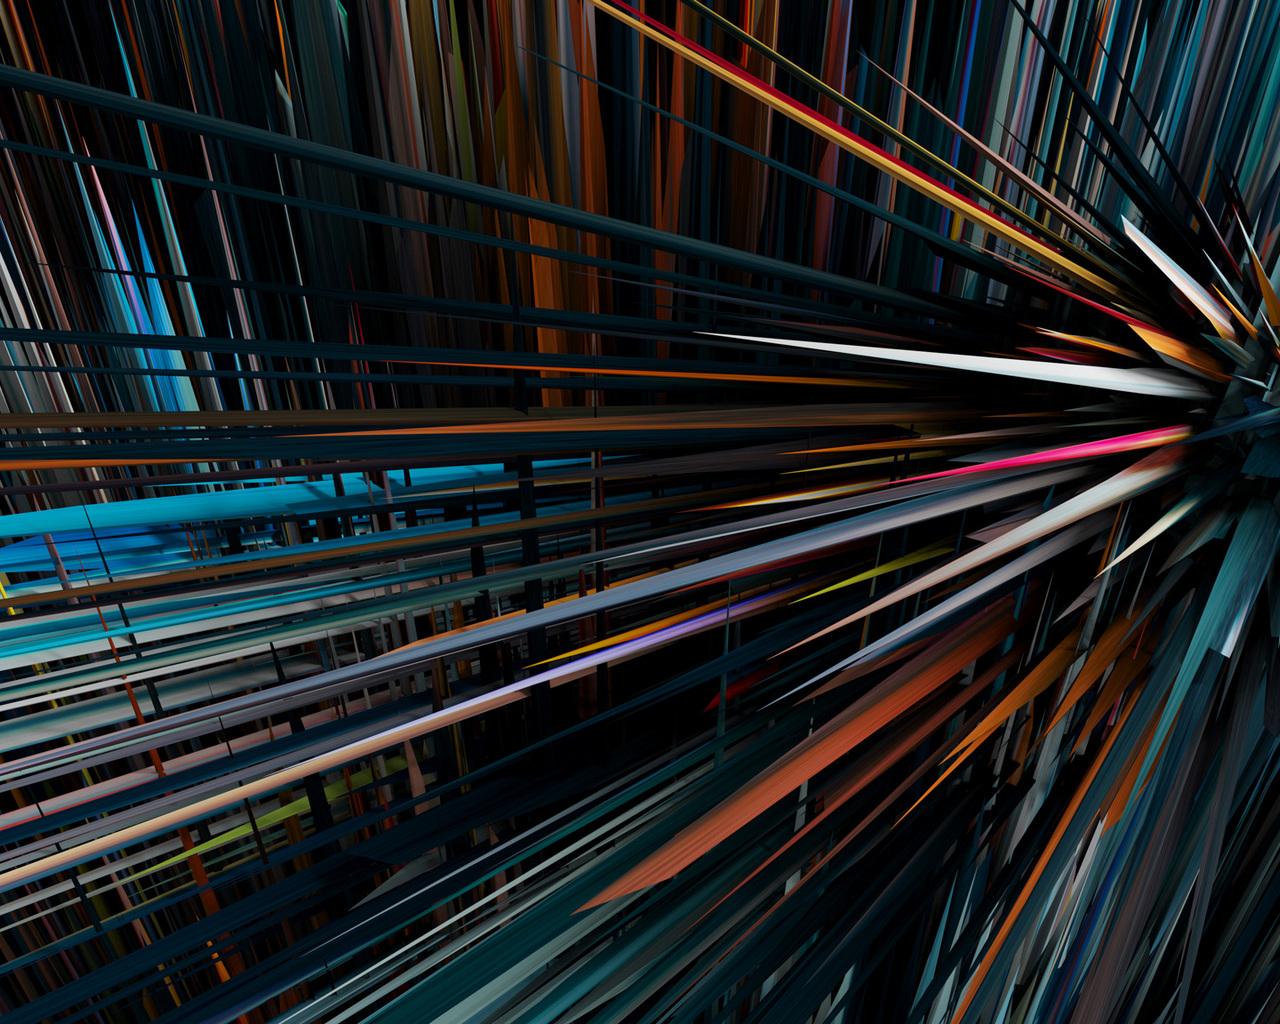 sharp-3d-comet-digital-art-abstract-ro.jpg